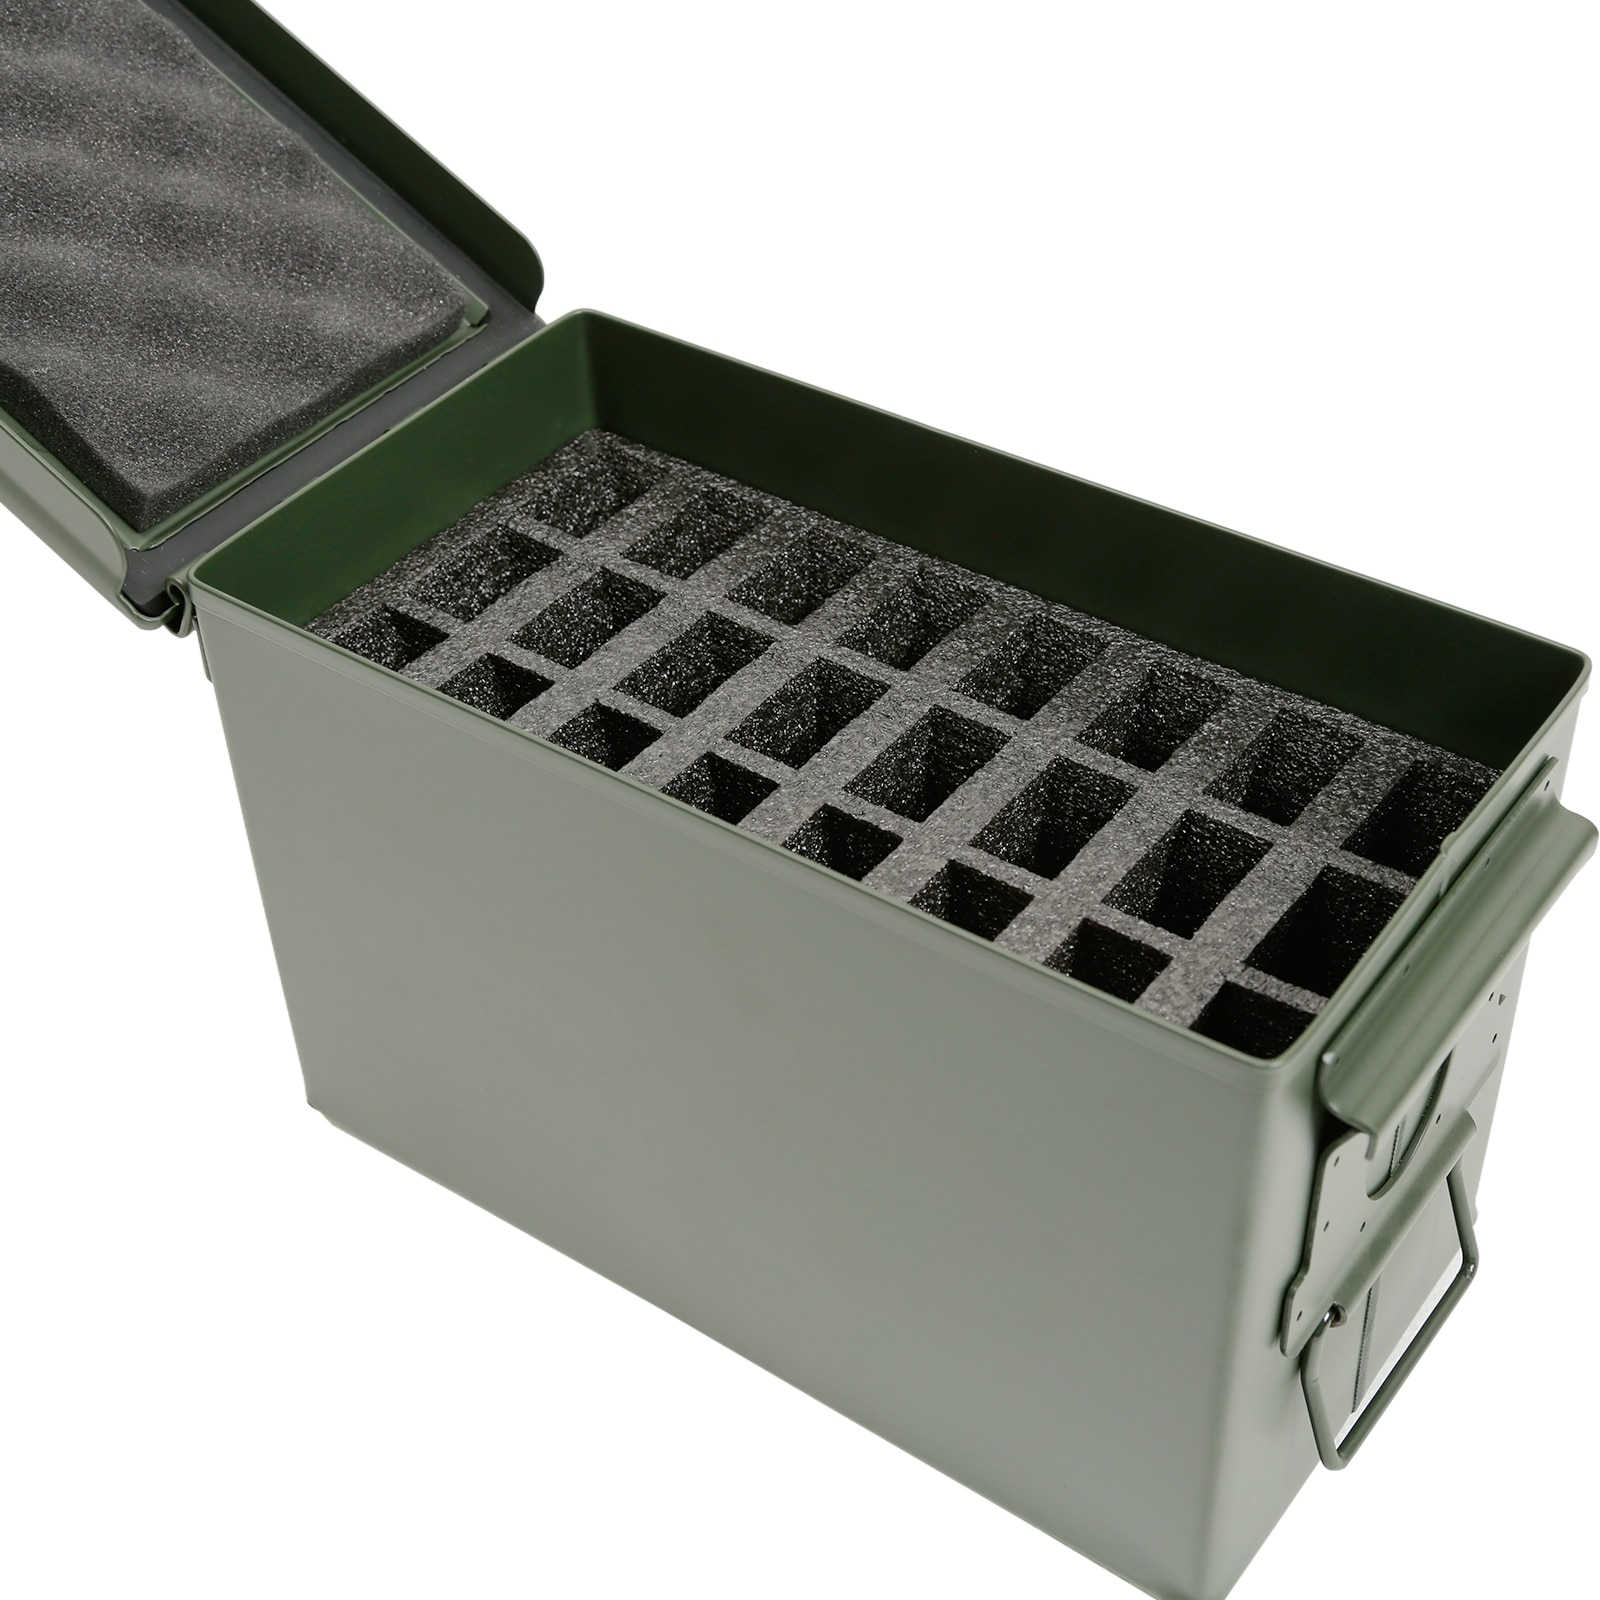 .50 Cal Ammo Can 24 Pistol Magazine Holder Foam - Insert for Steel 50 Caliber Ammunition Box (M2A1) - Replaces Gun Clip Pouch